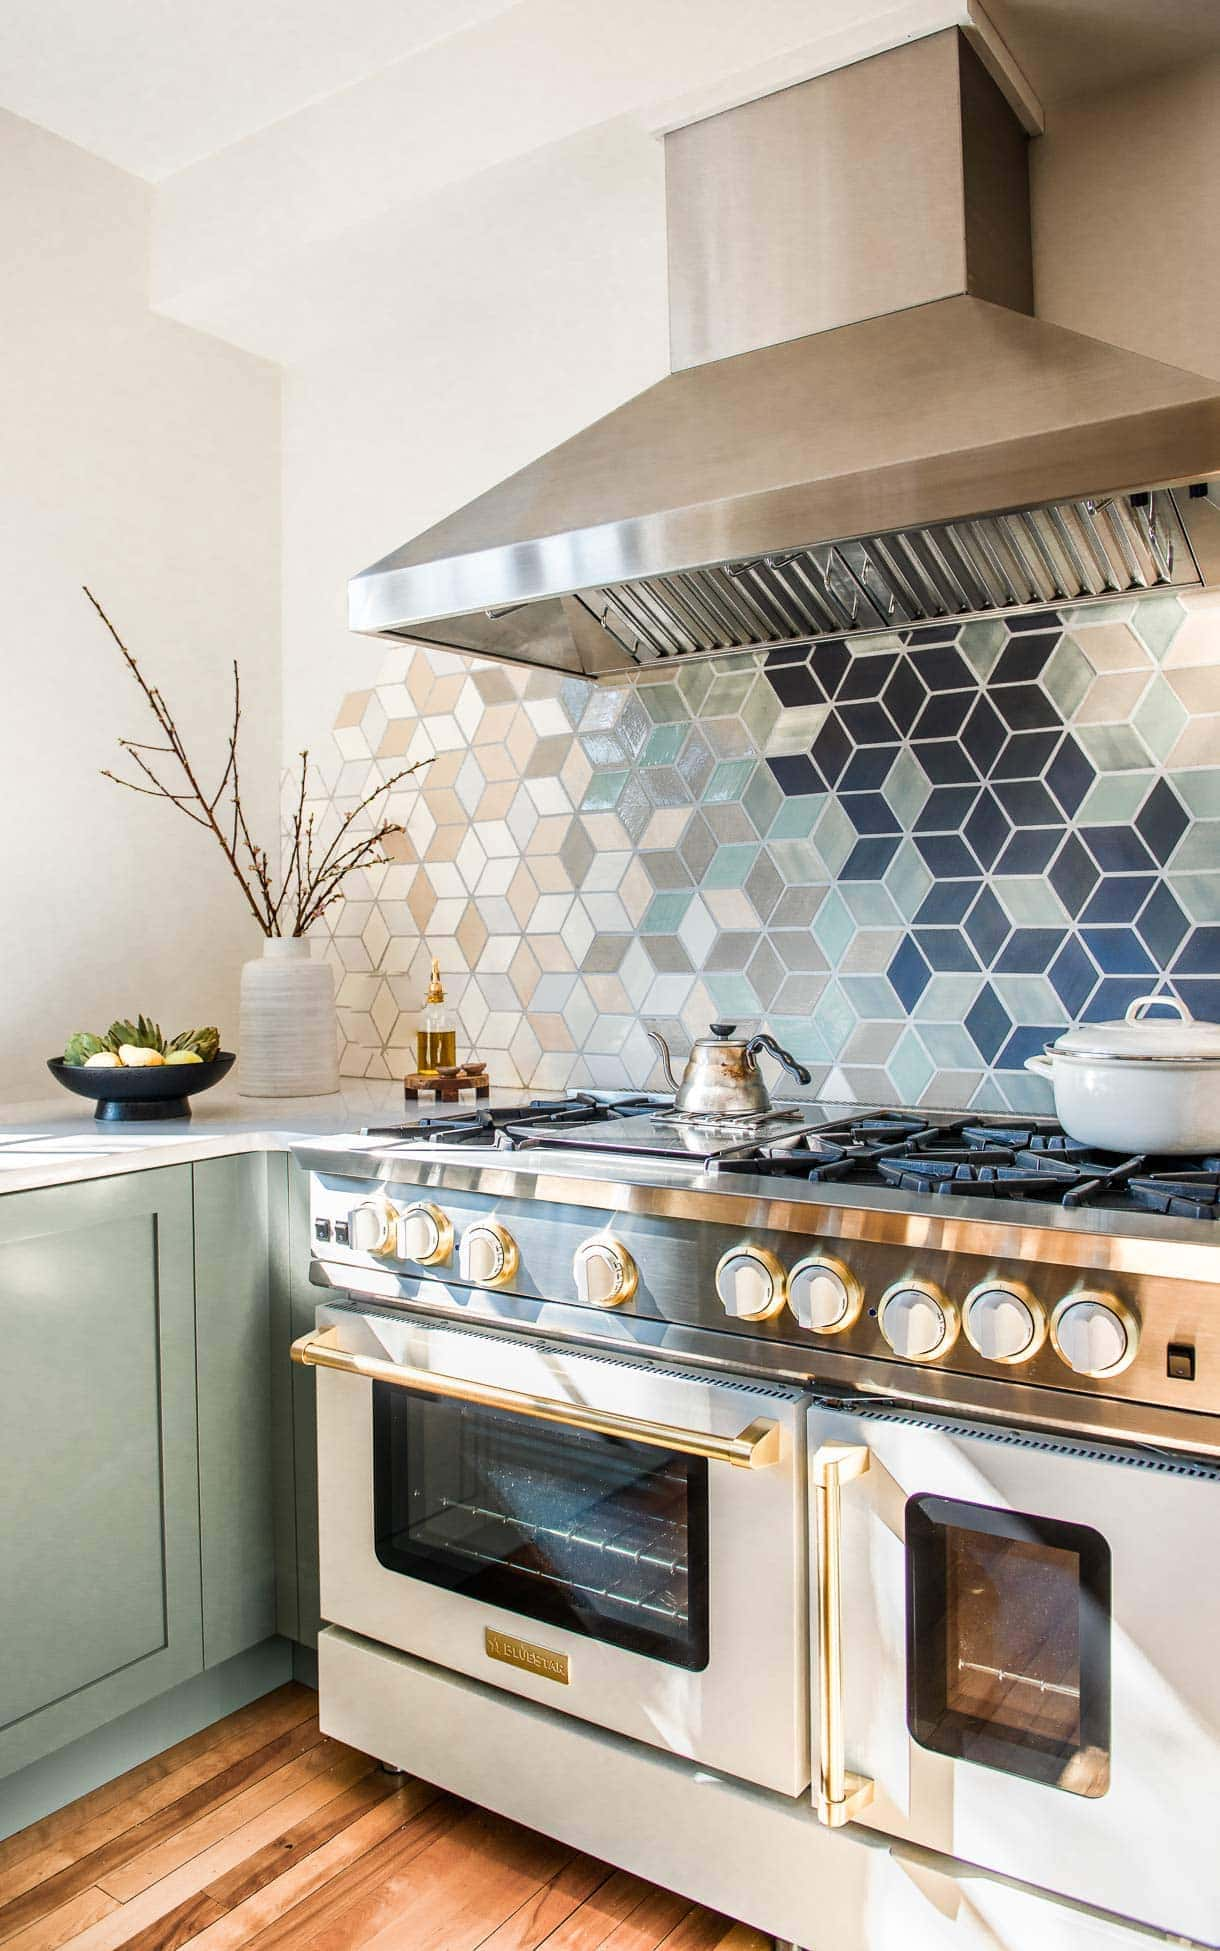 modern u-shaped kitchen with white walls, frameless window, open shelving